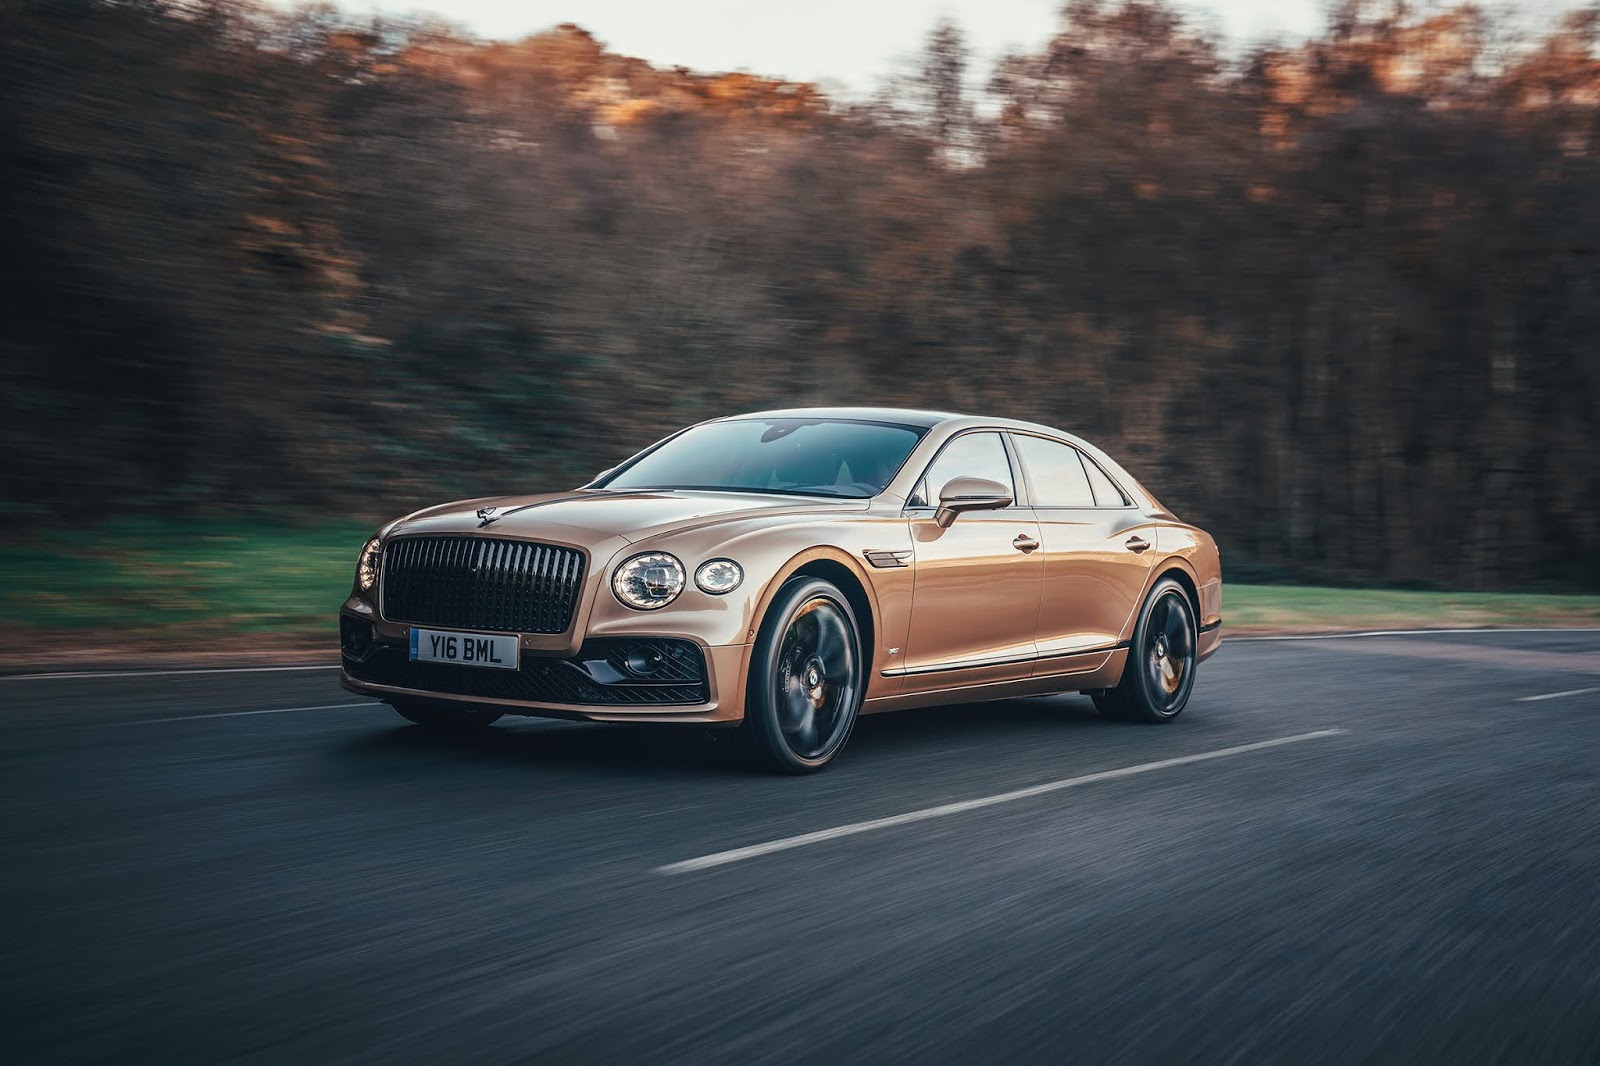 BENTLEY2BFLYING2BSPUR2BV8 Bentley : Ο προηγμένος V8 της Flying Spur